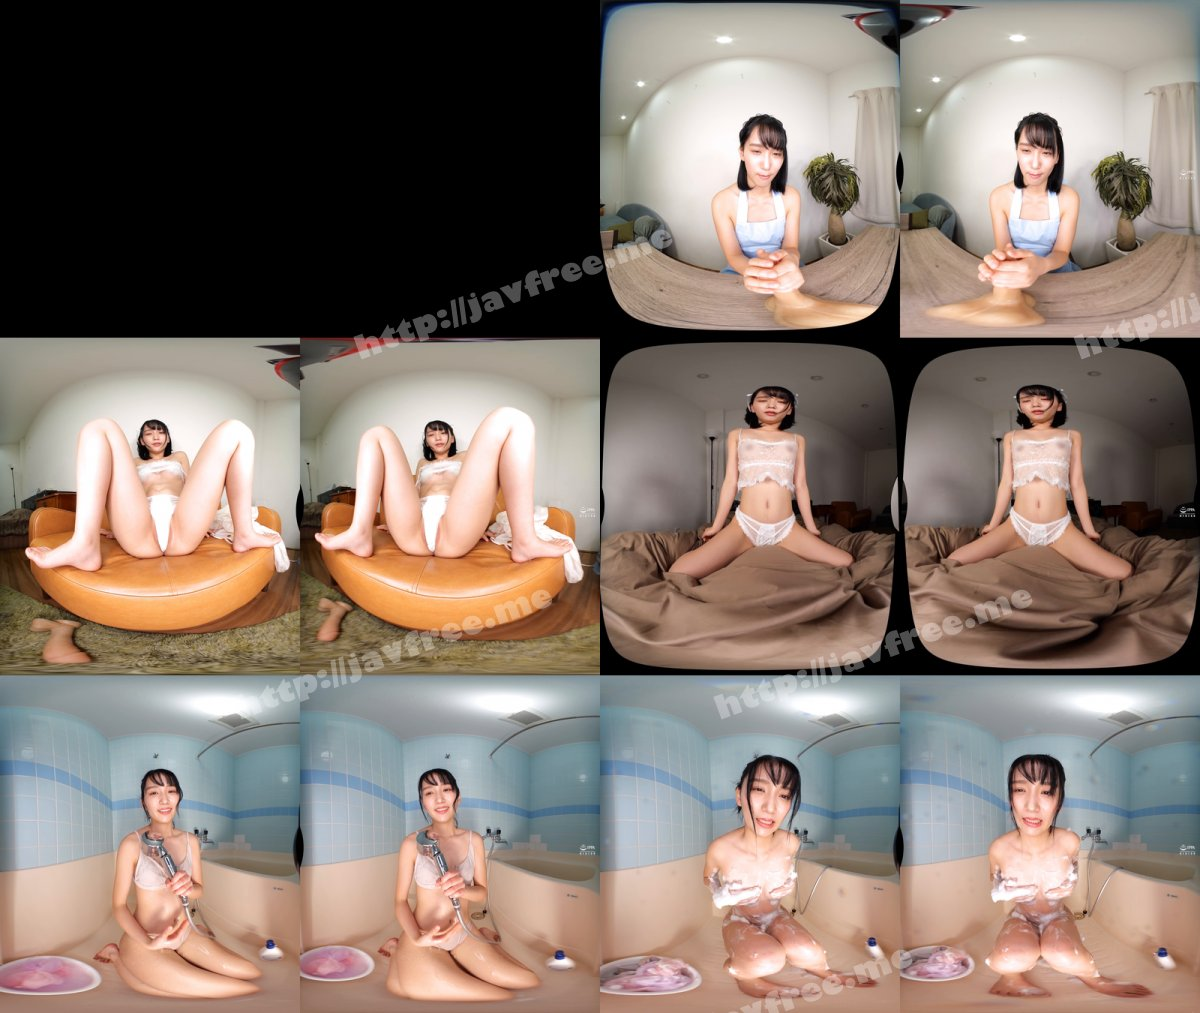 [CAIM-009] 【VR】限界着エロ無双!! 天使的清純美少女「天羽成美」最強レベルの伝説級VR - image CAIM-009 on https://javfree.me